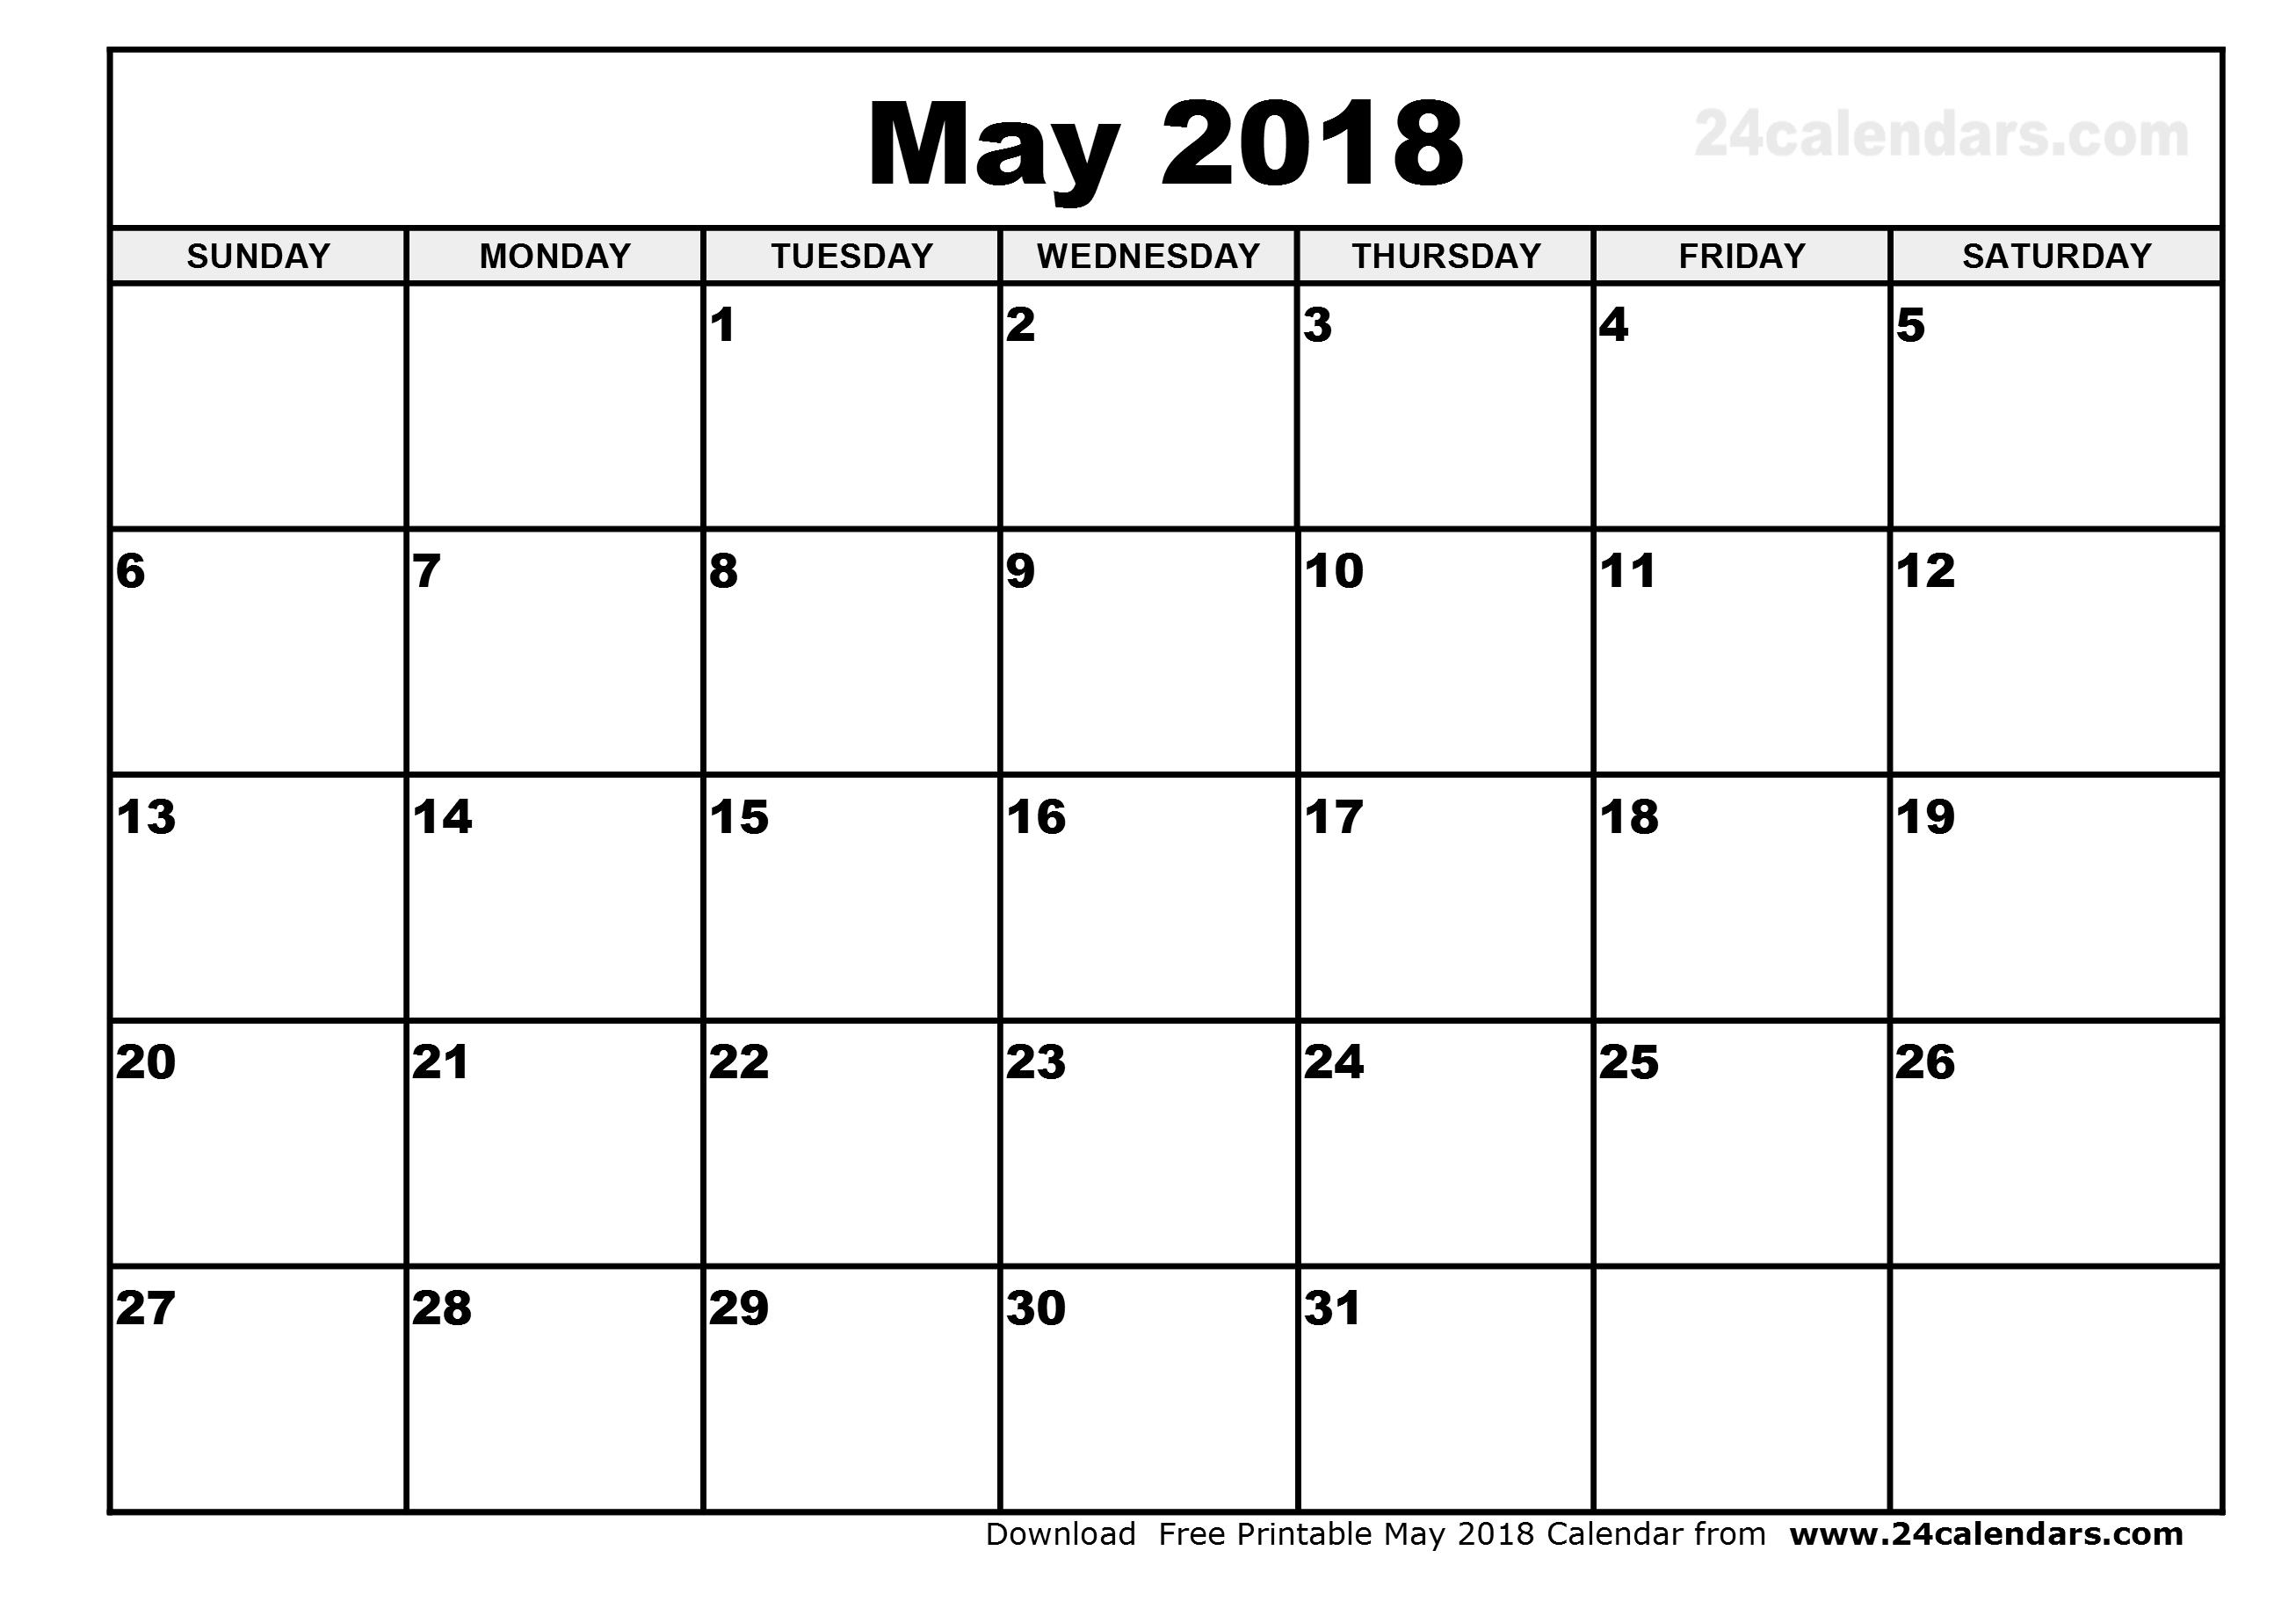 May 2018 Printable Calendar Monthly Calendar Template 89uj